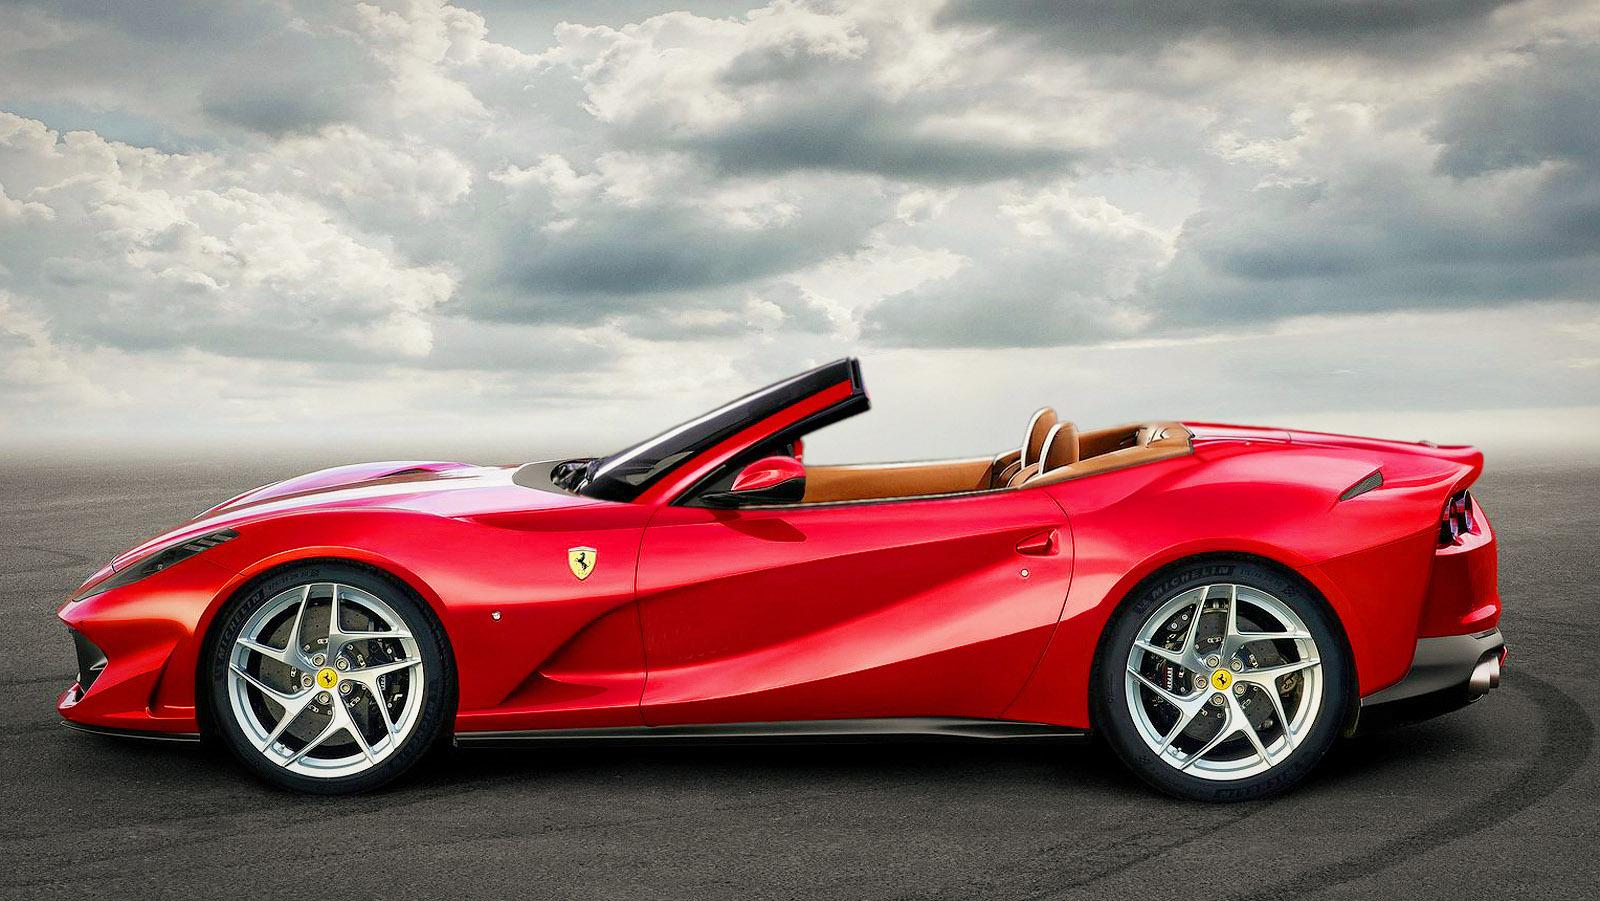 Ferrari 812 Superfast Hardtop Convertible Coming Soon: Report